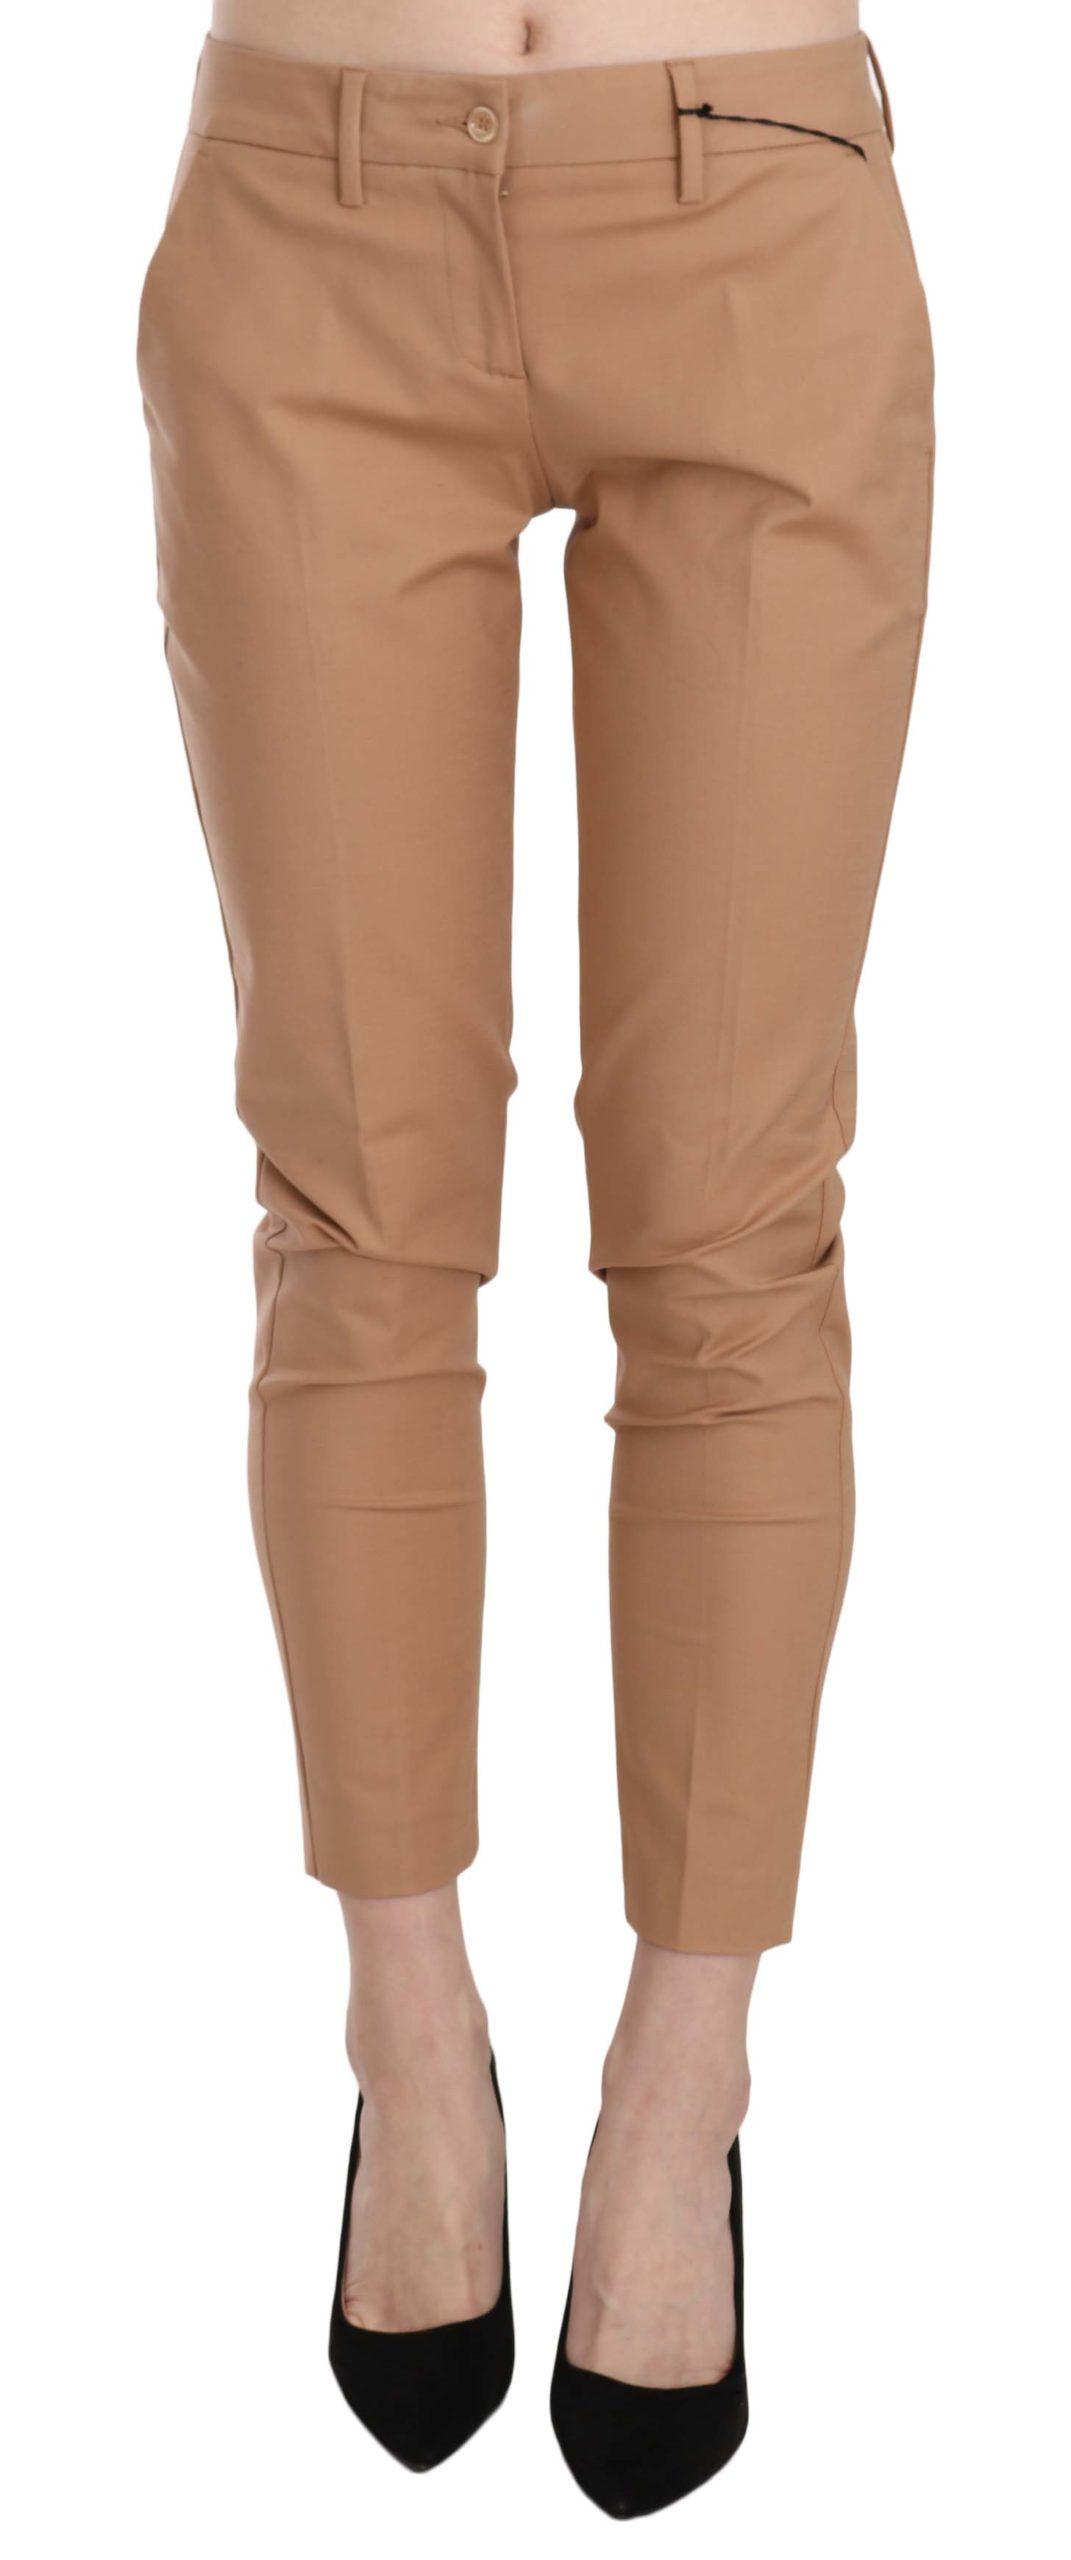 Just Cavalli Women's Mid Waist Cotton Skinny Trouser Beige PAN70357 - IT40 S